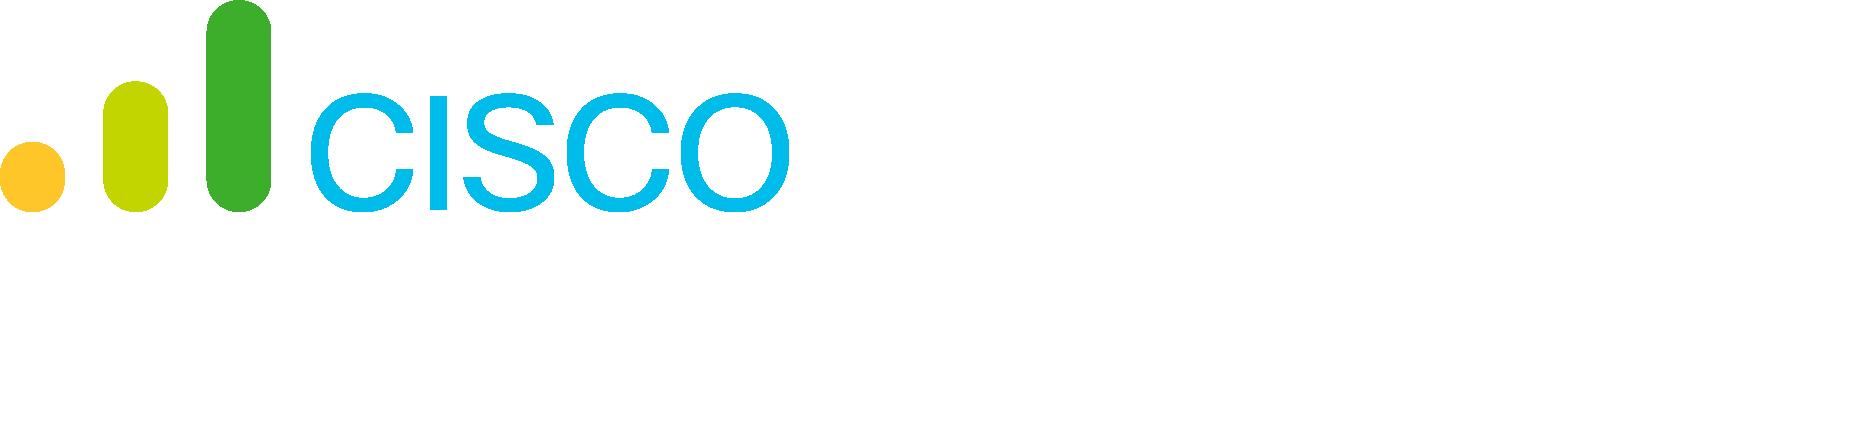 CIS-001_Brand Identity Development_3C_Reversed (1)